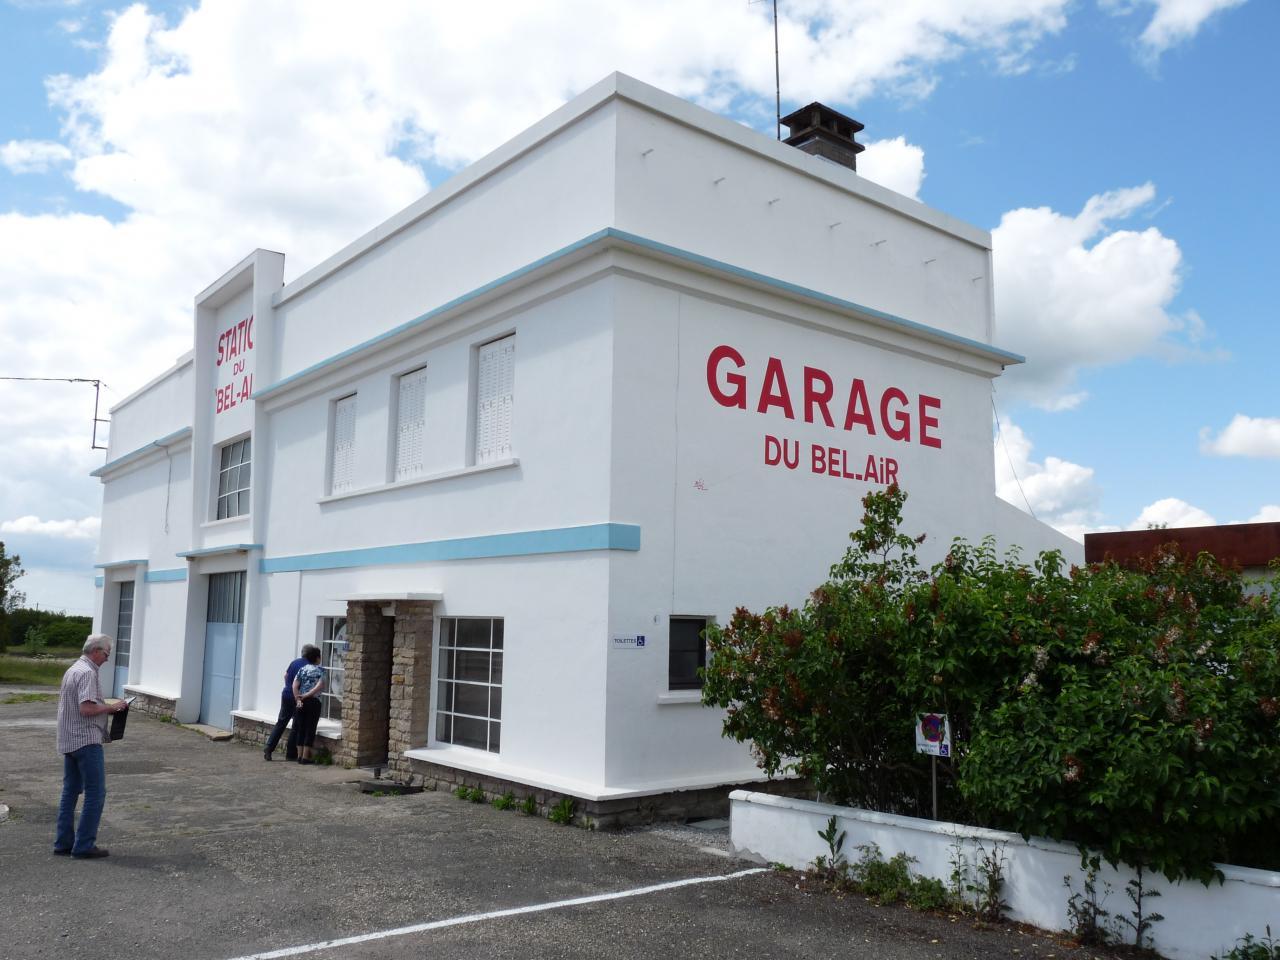 garage bel air la rochepot sur la nationale 6. Black Bedroom Furniture Sets. Home Design Ideas